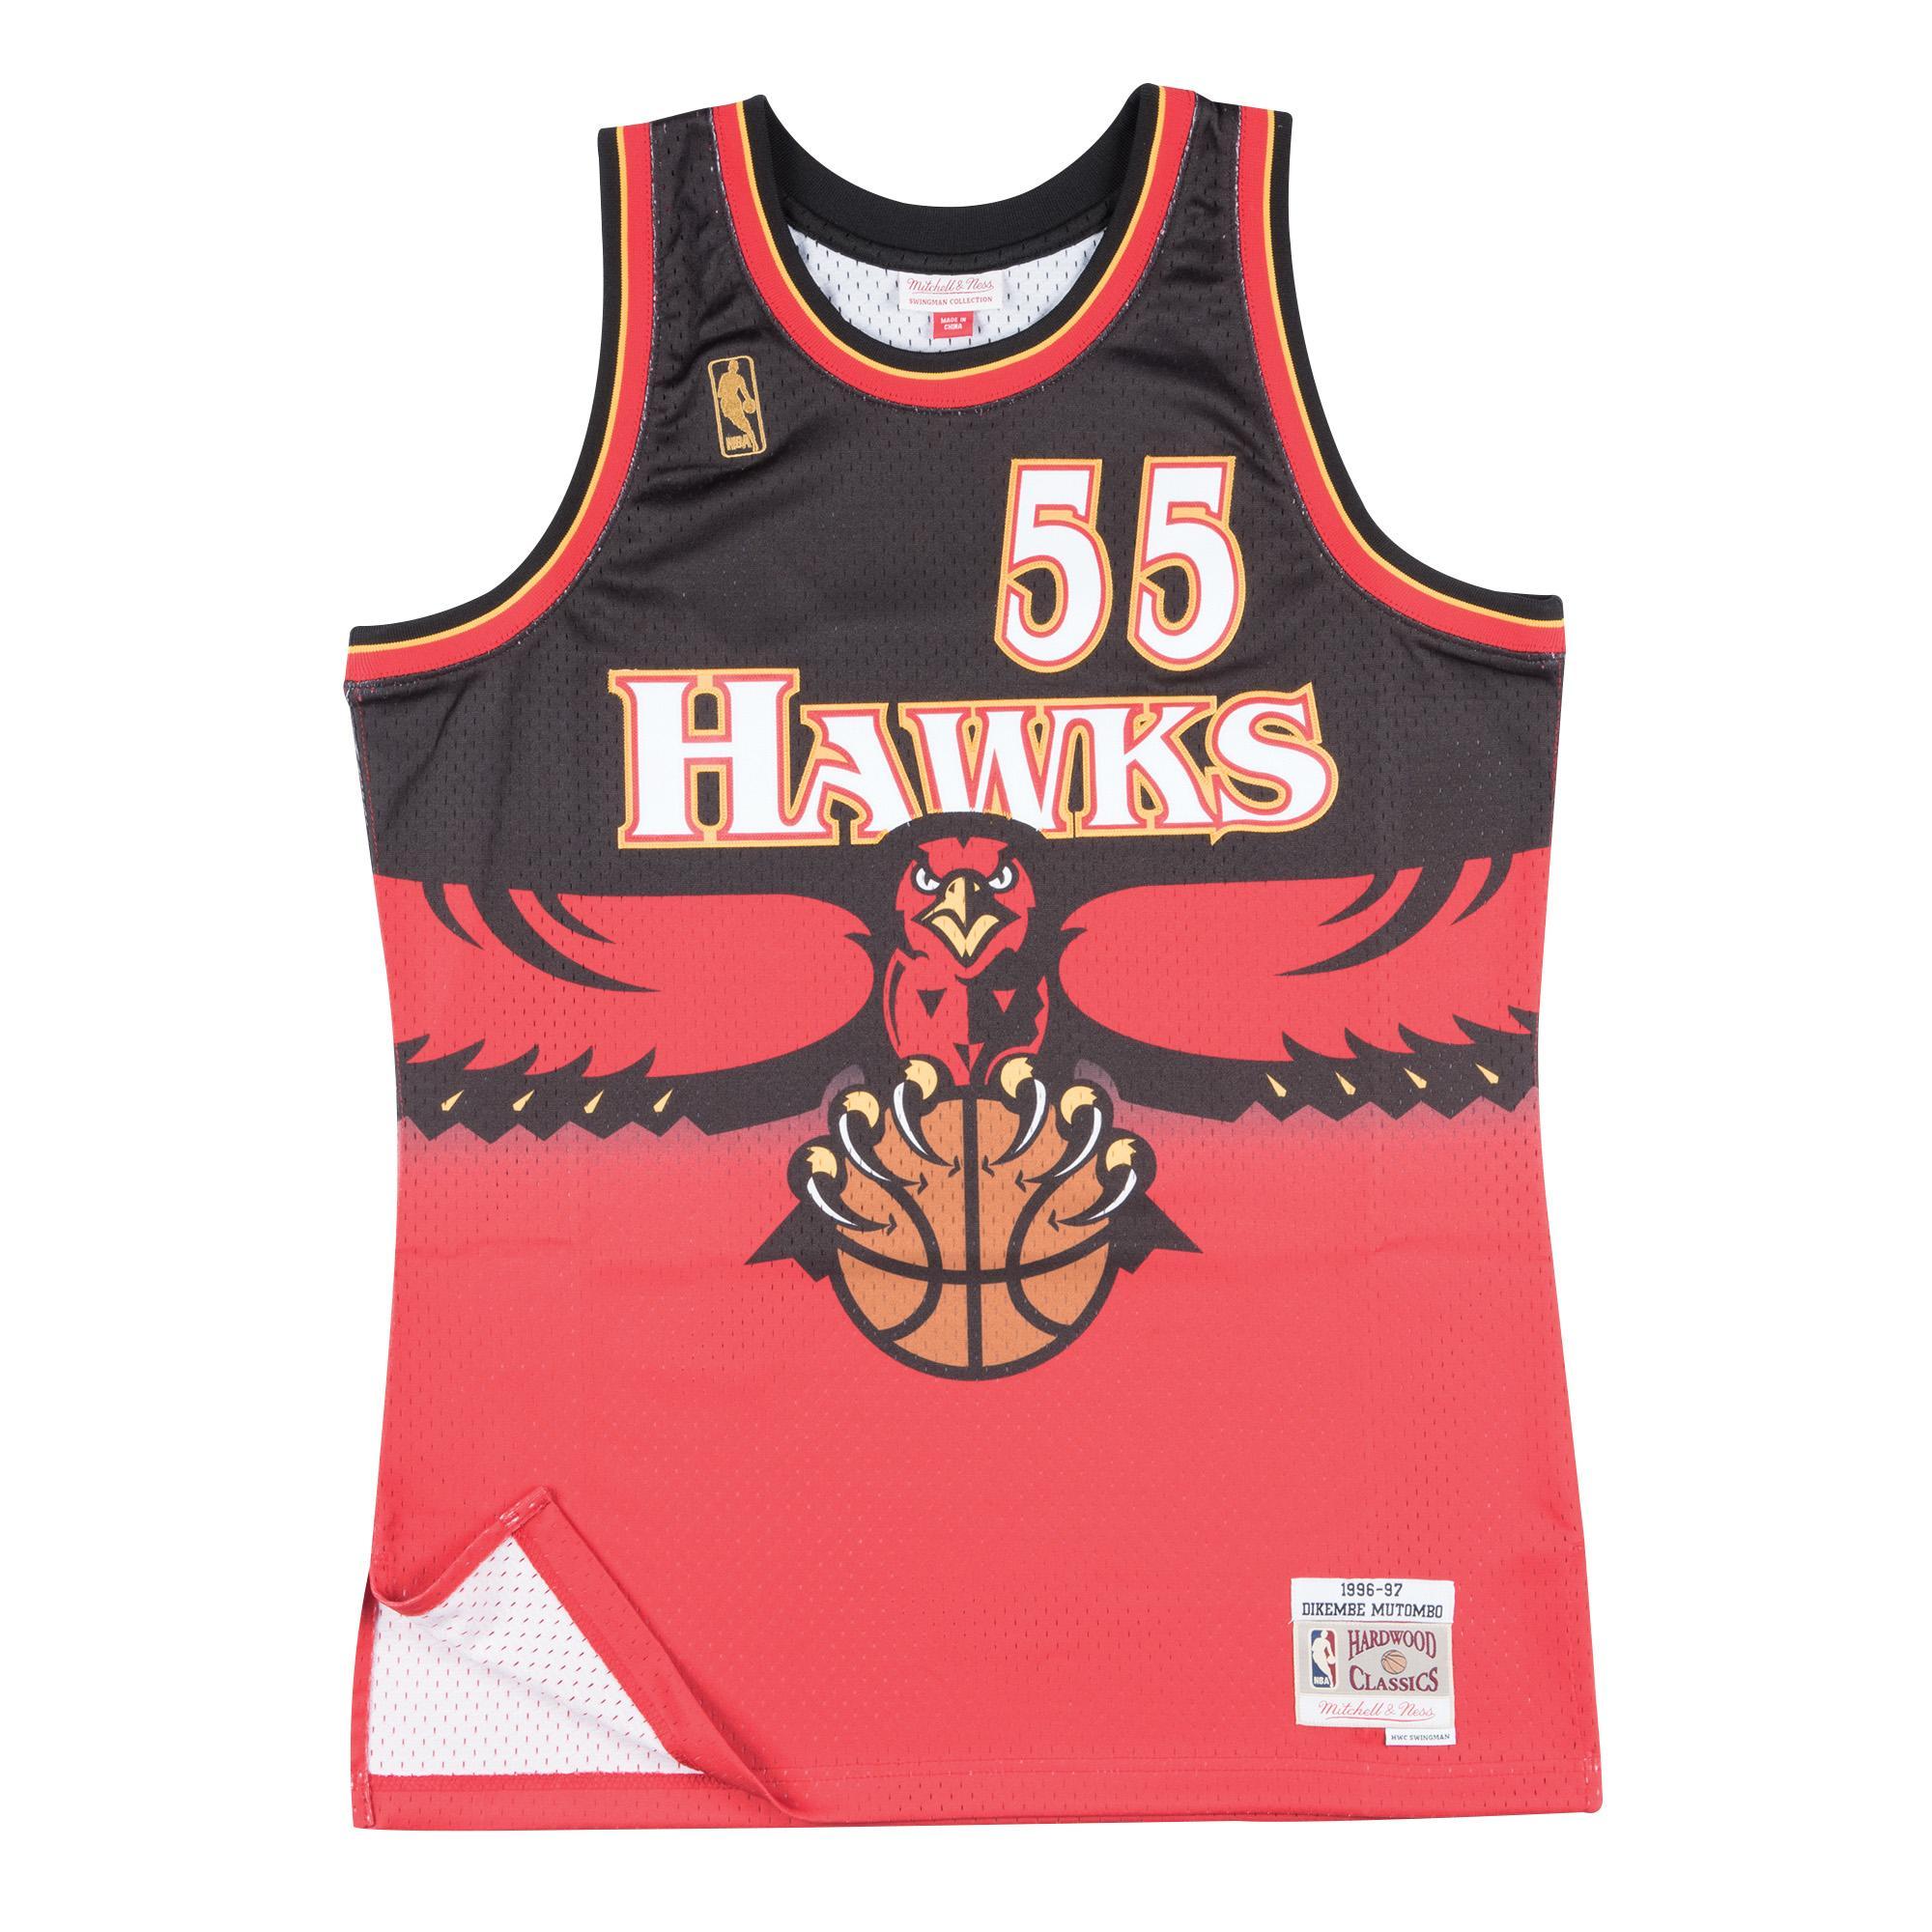 ac487c74aeb5 Dikembe Mutombo 1996-97 Road Swingman Jersey Atlanta Hawks